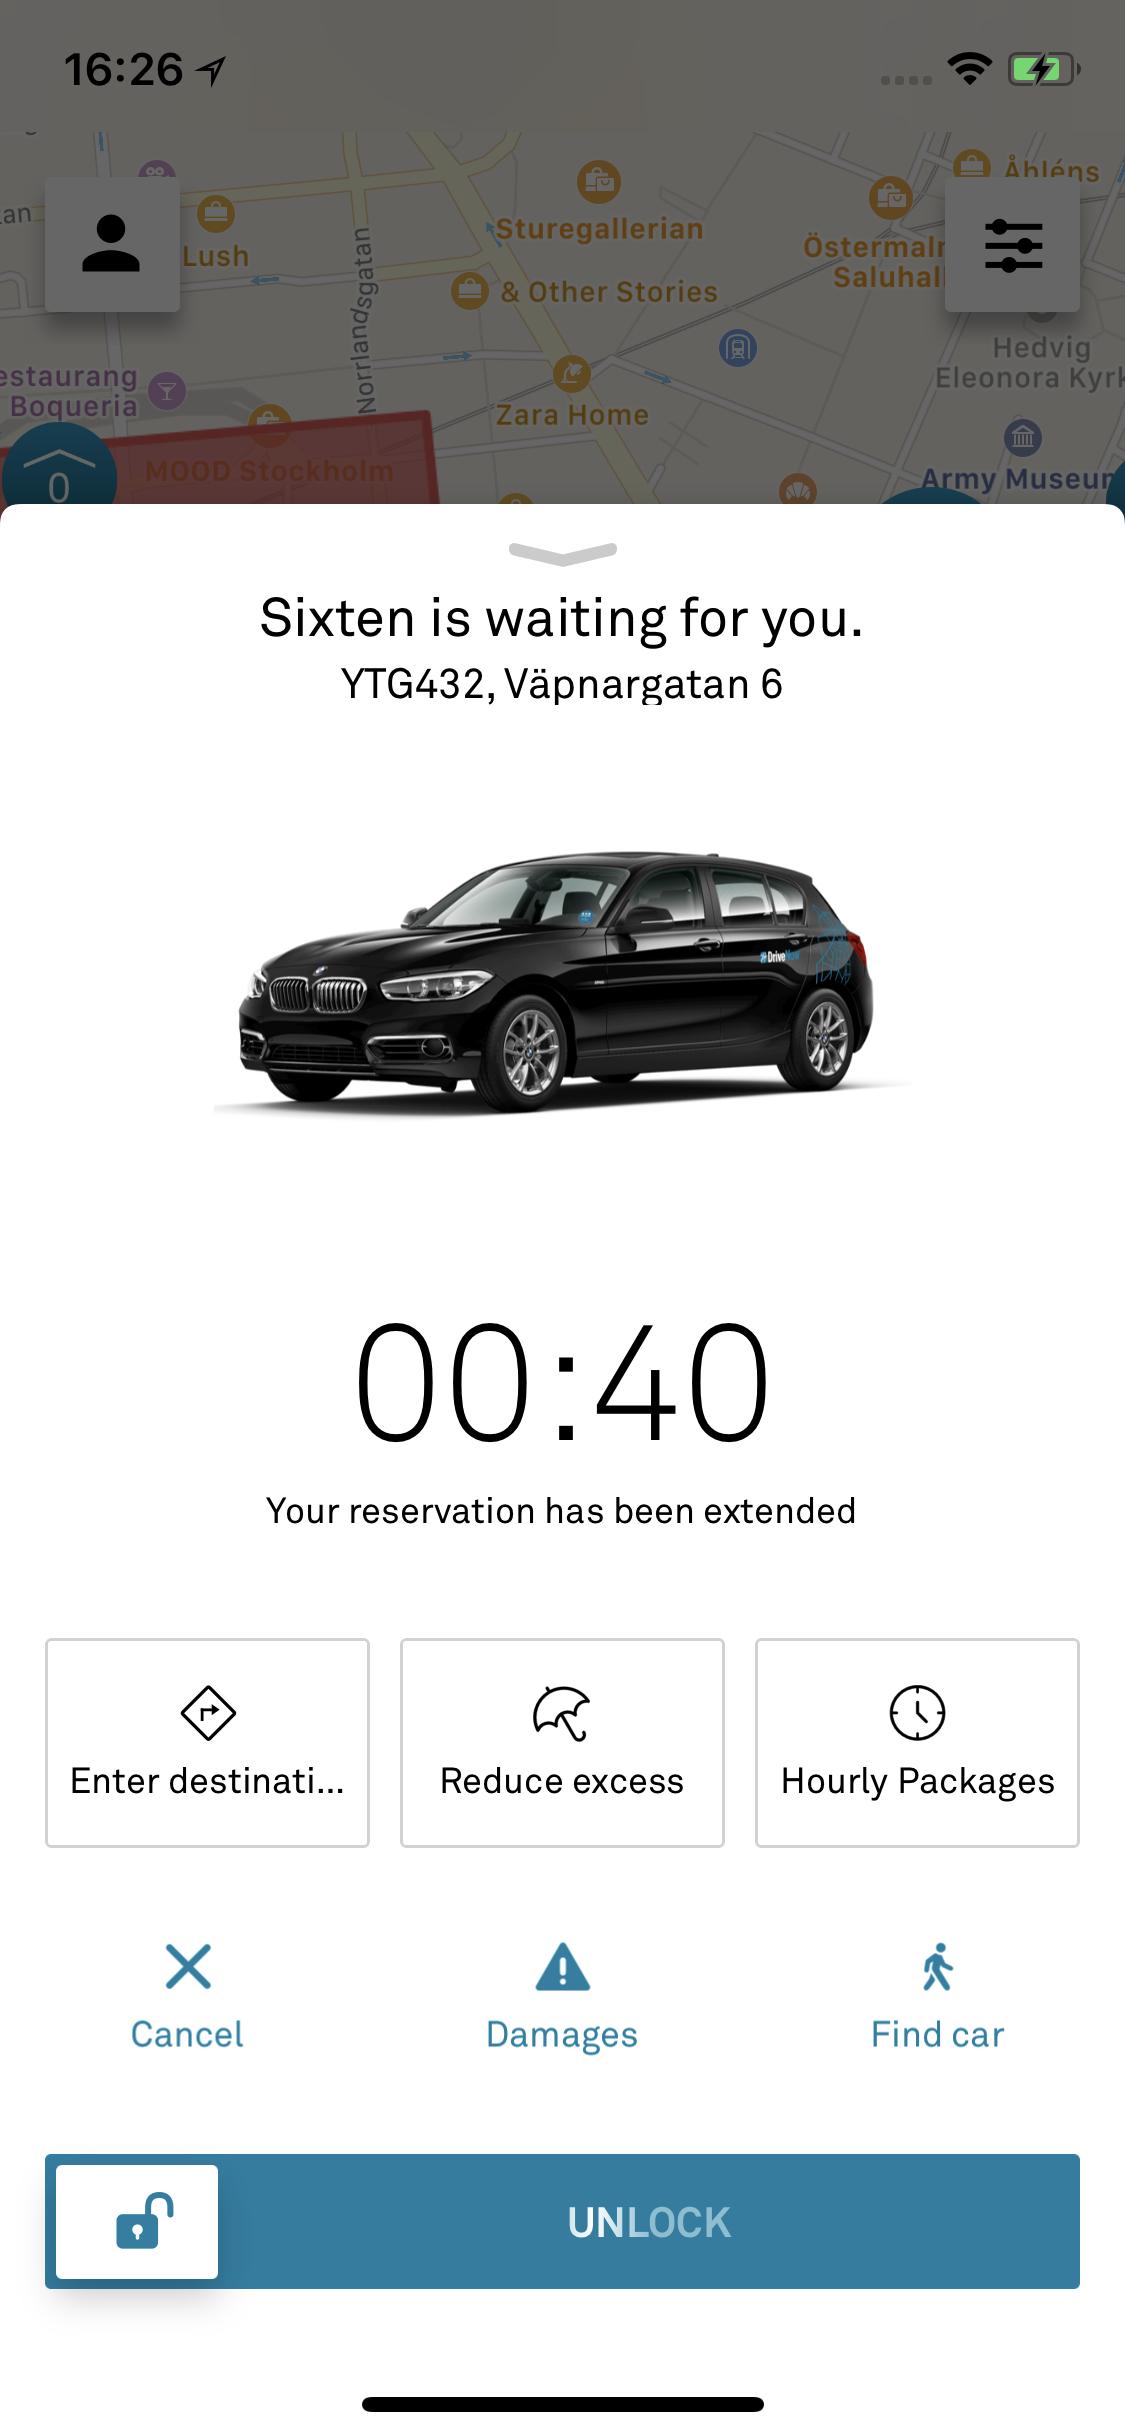 SE_carsharing_tips-tricks_extend-reservation